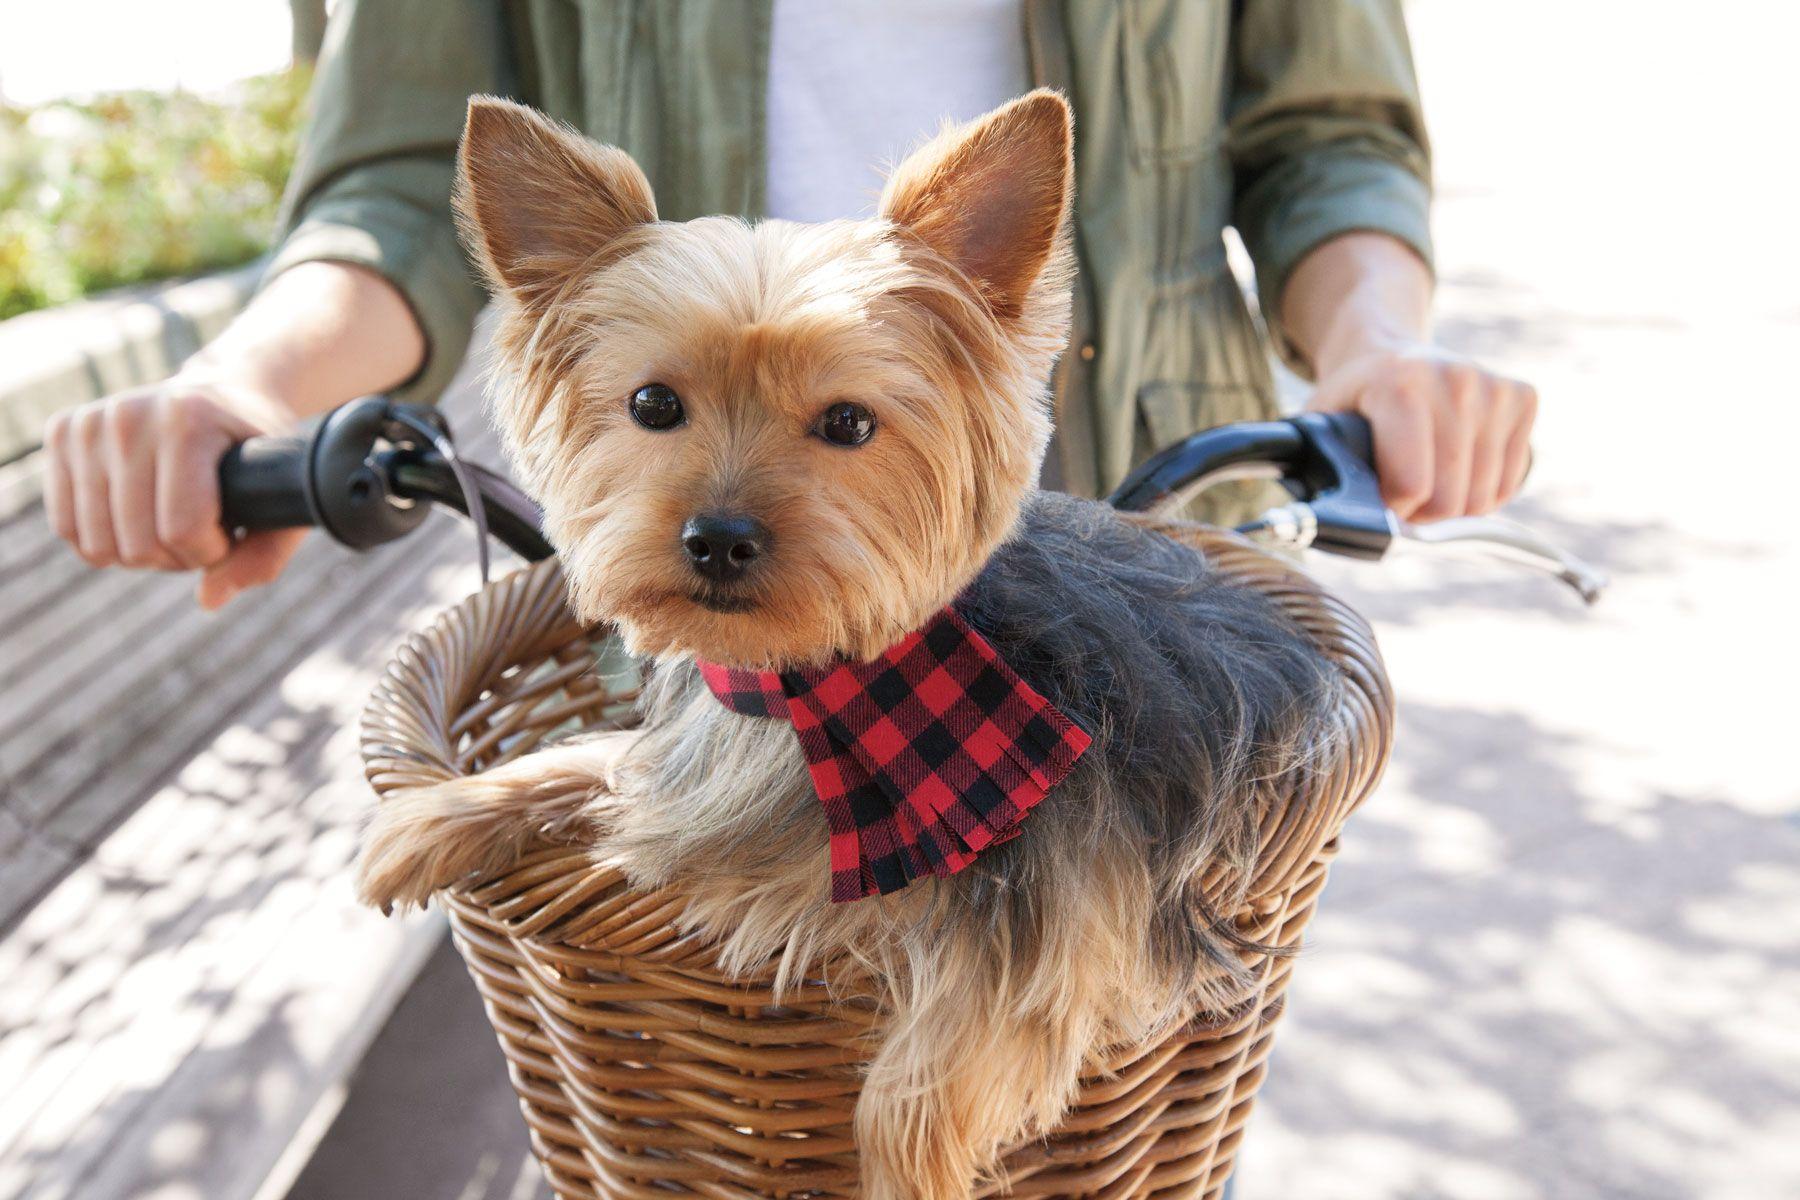 Here S My Pet Photo Petsmart Grooming Animal Photo Petsmart